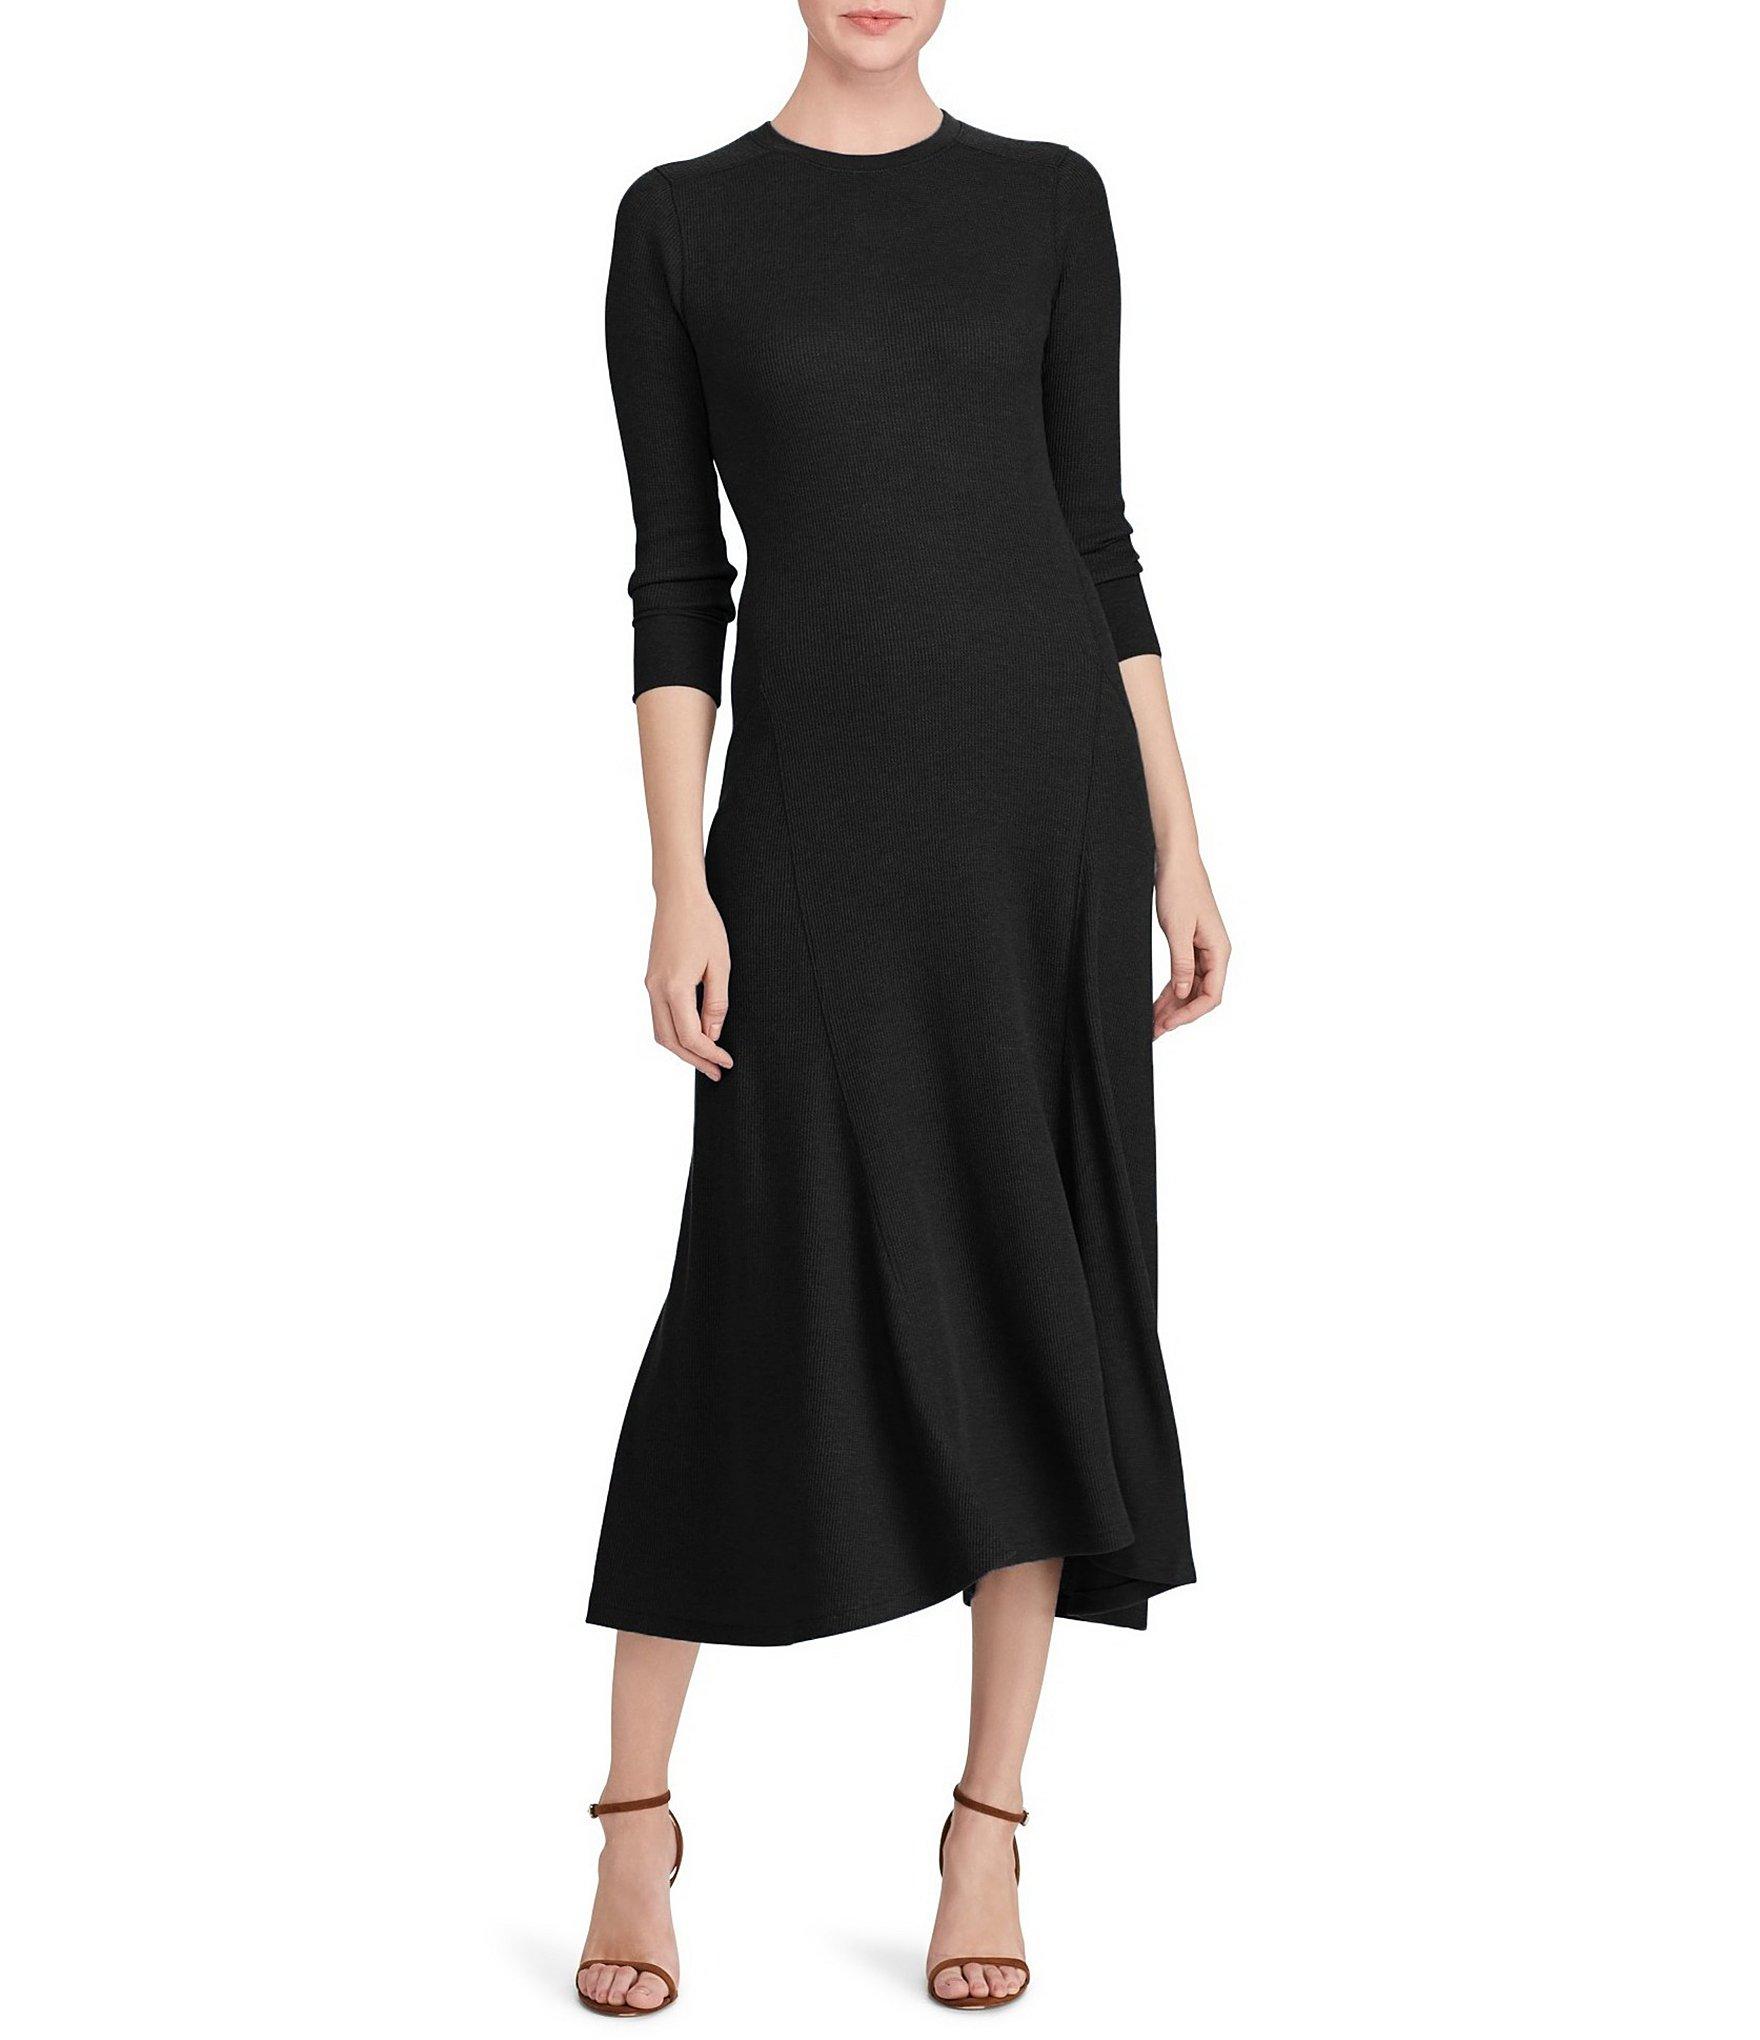 polo ralph lauren long sleeve olivia cotton shirt dress. Black Bedroom Furniture Sets. Home Design Ideas